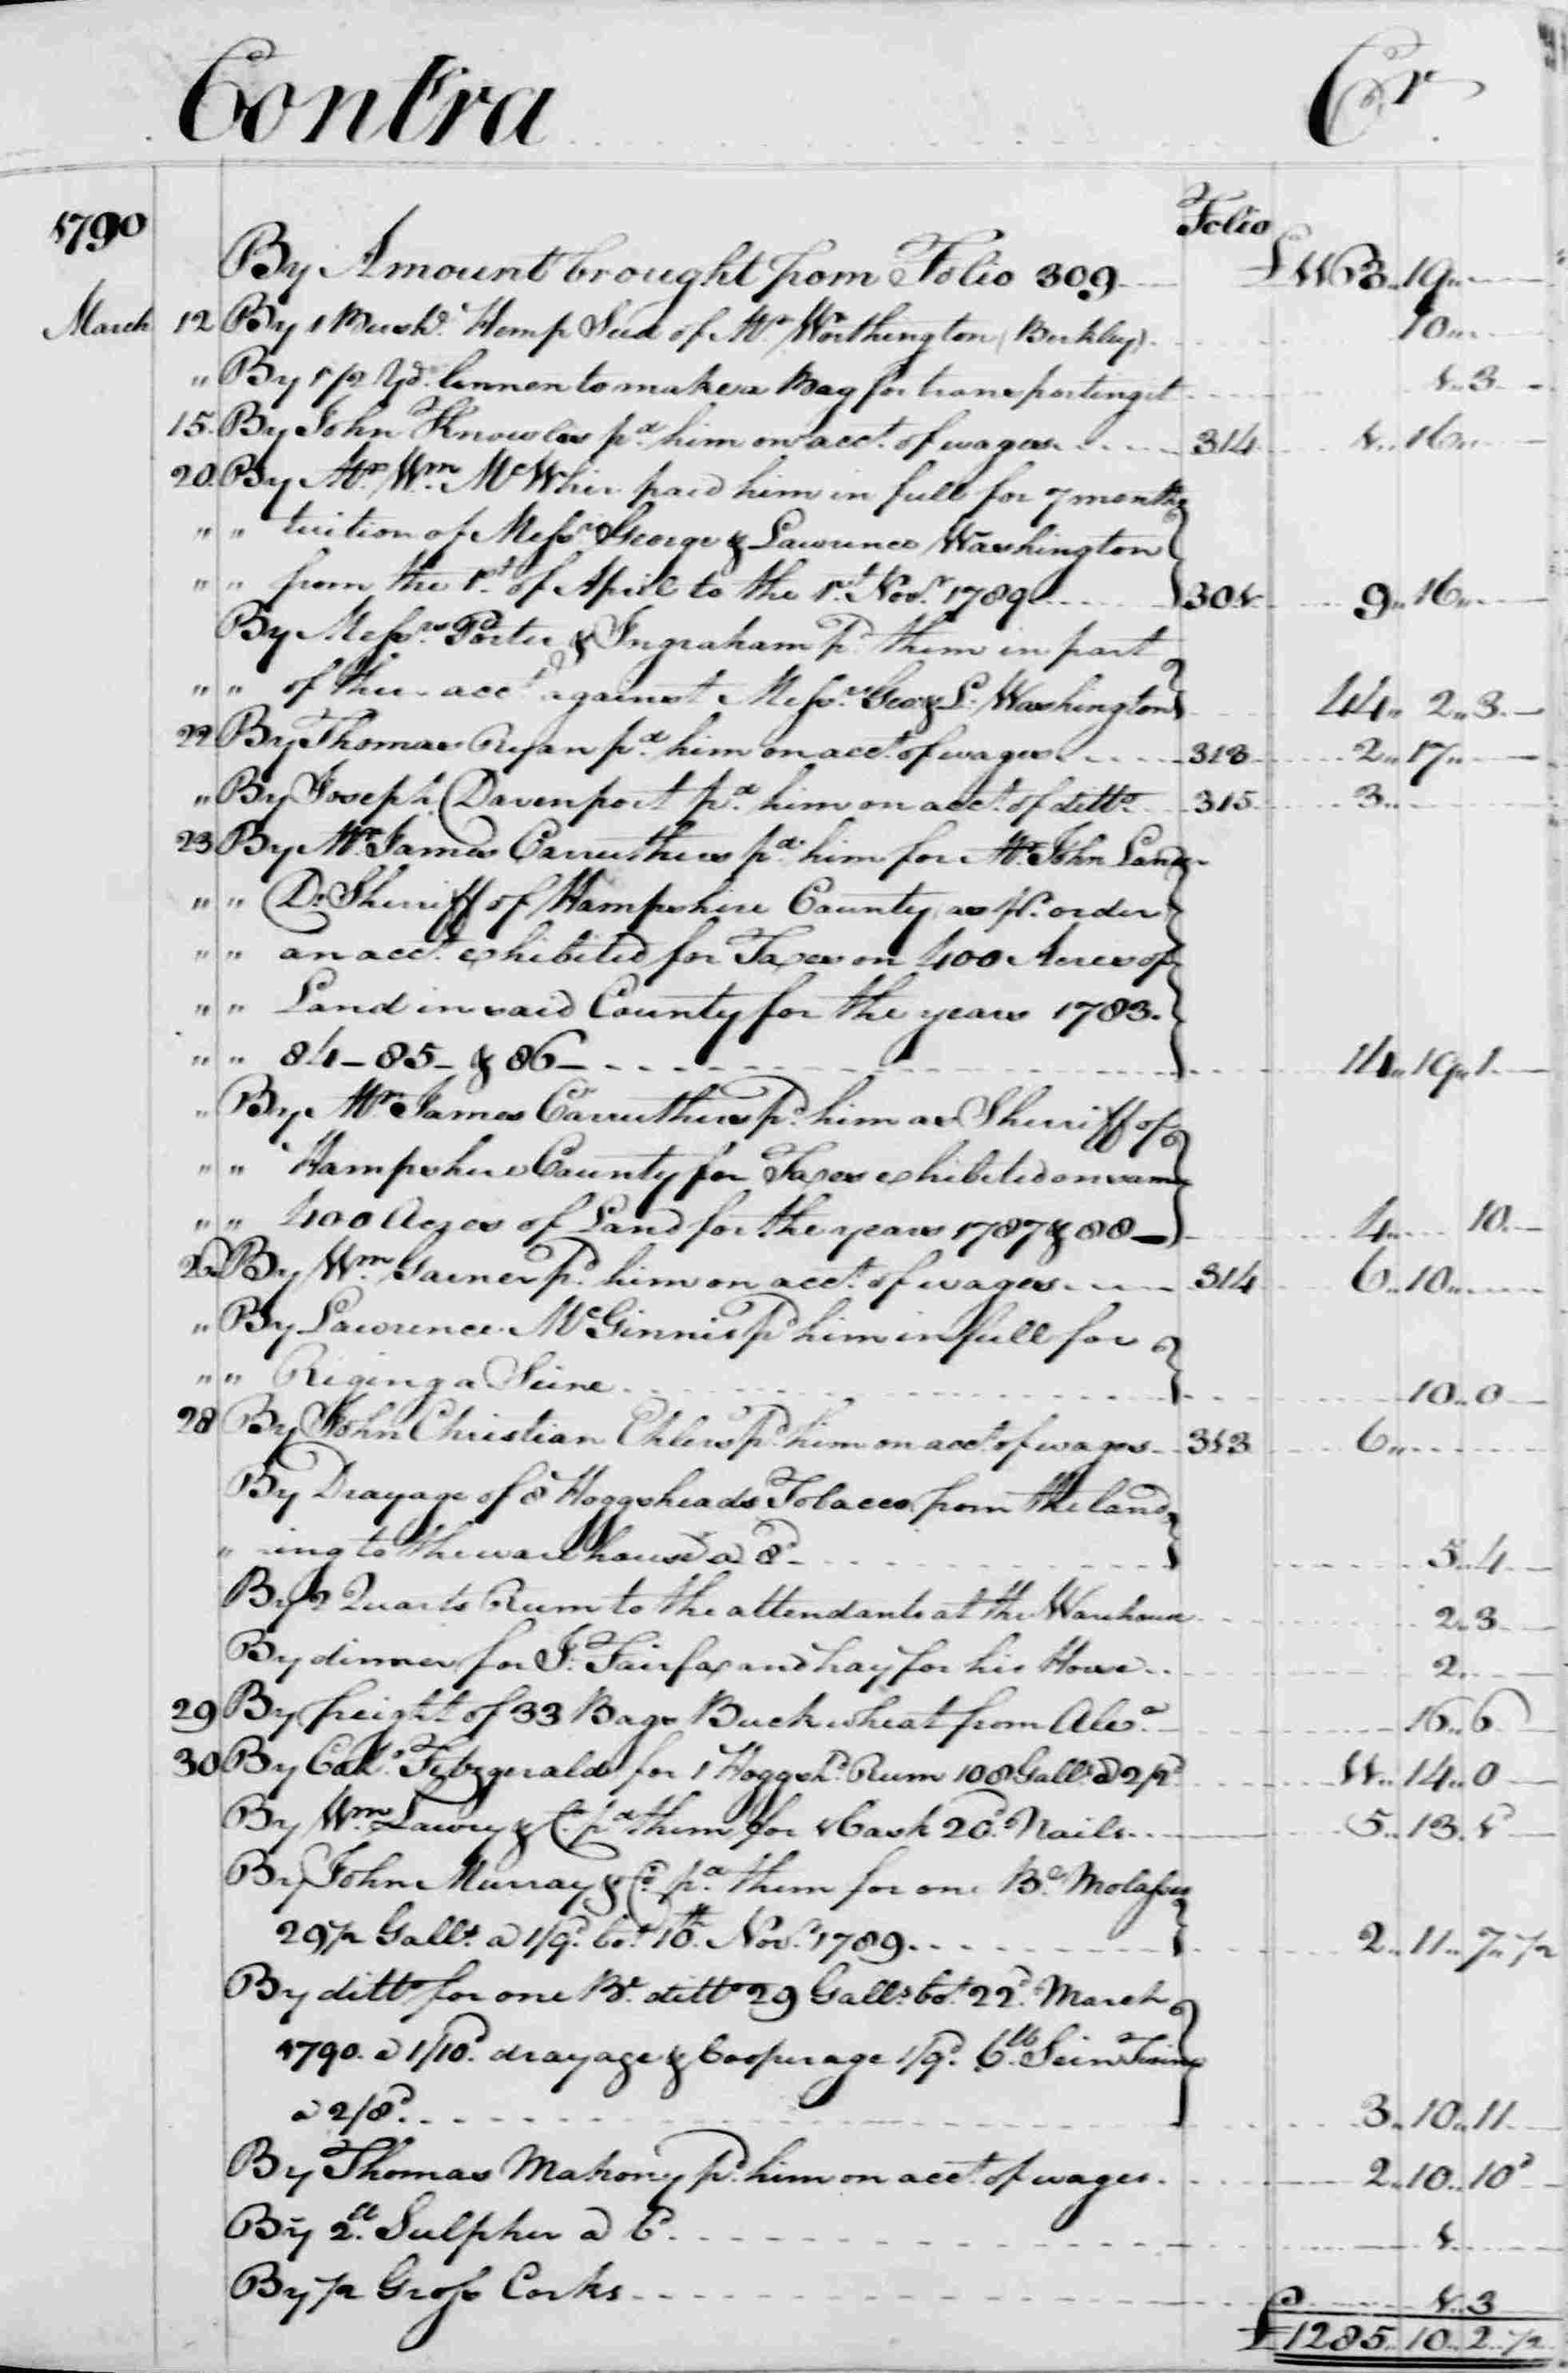 Ledger B, folio 311, right side